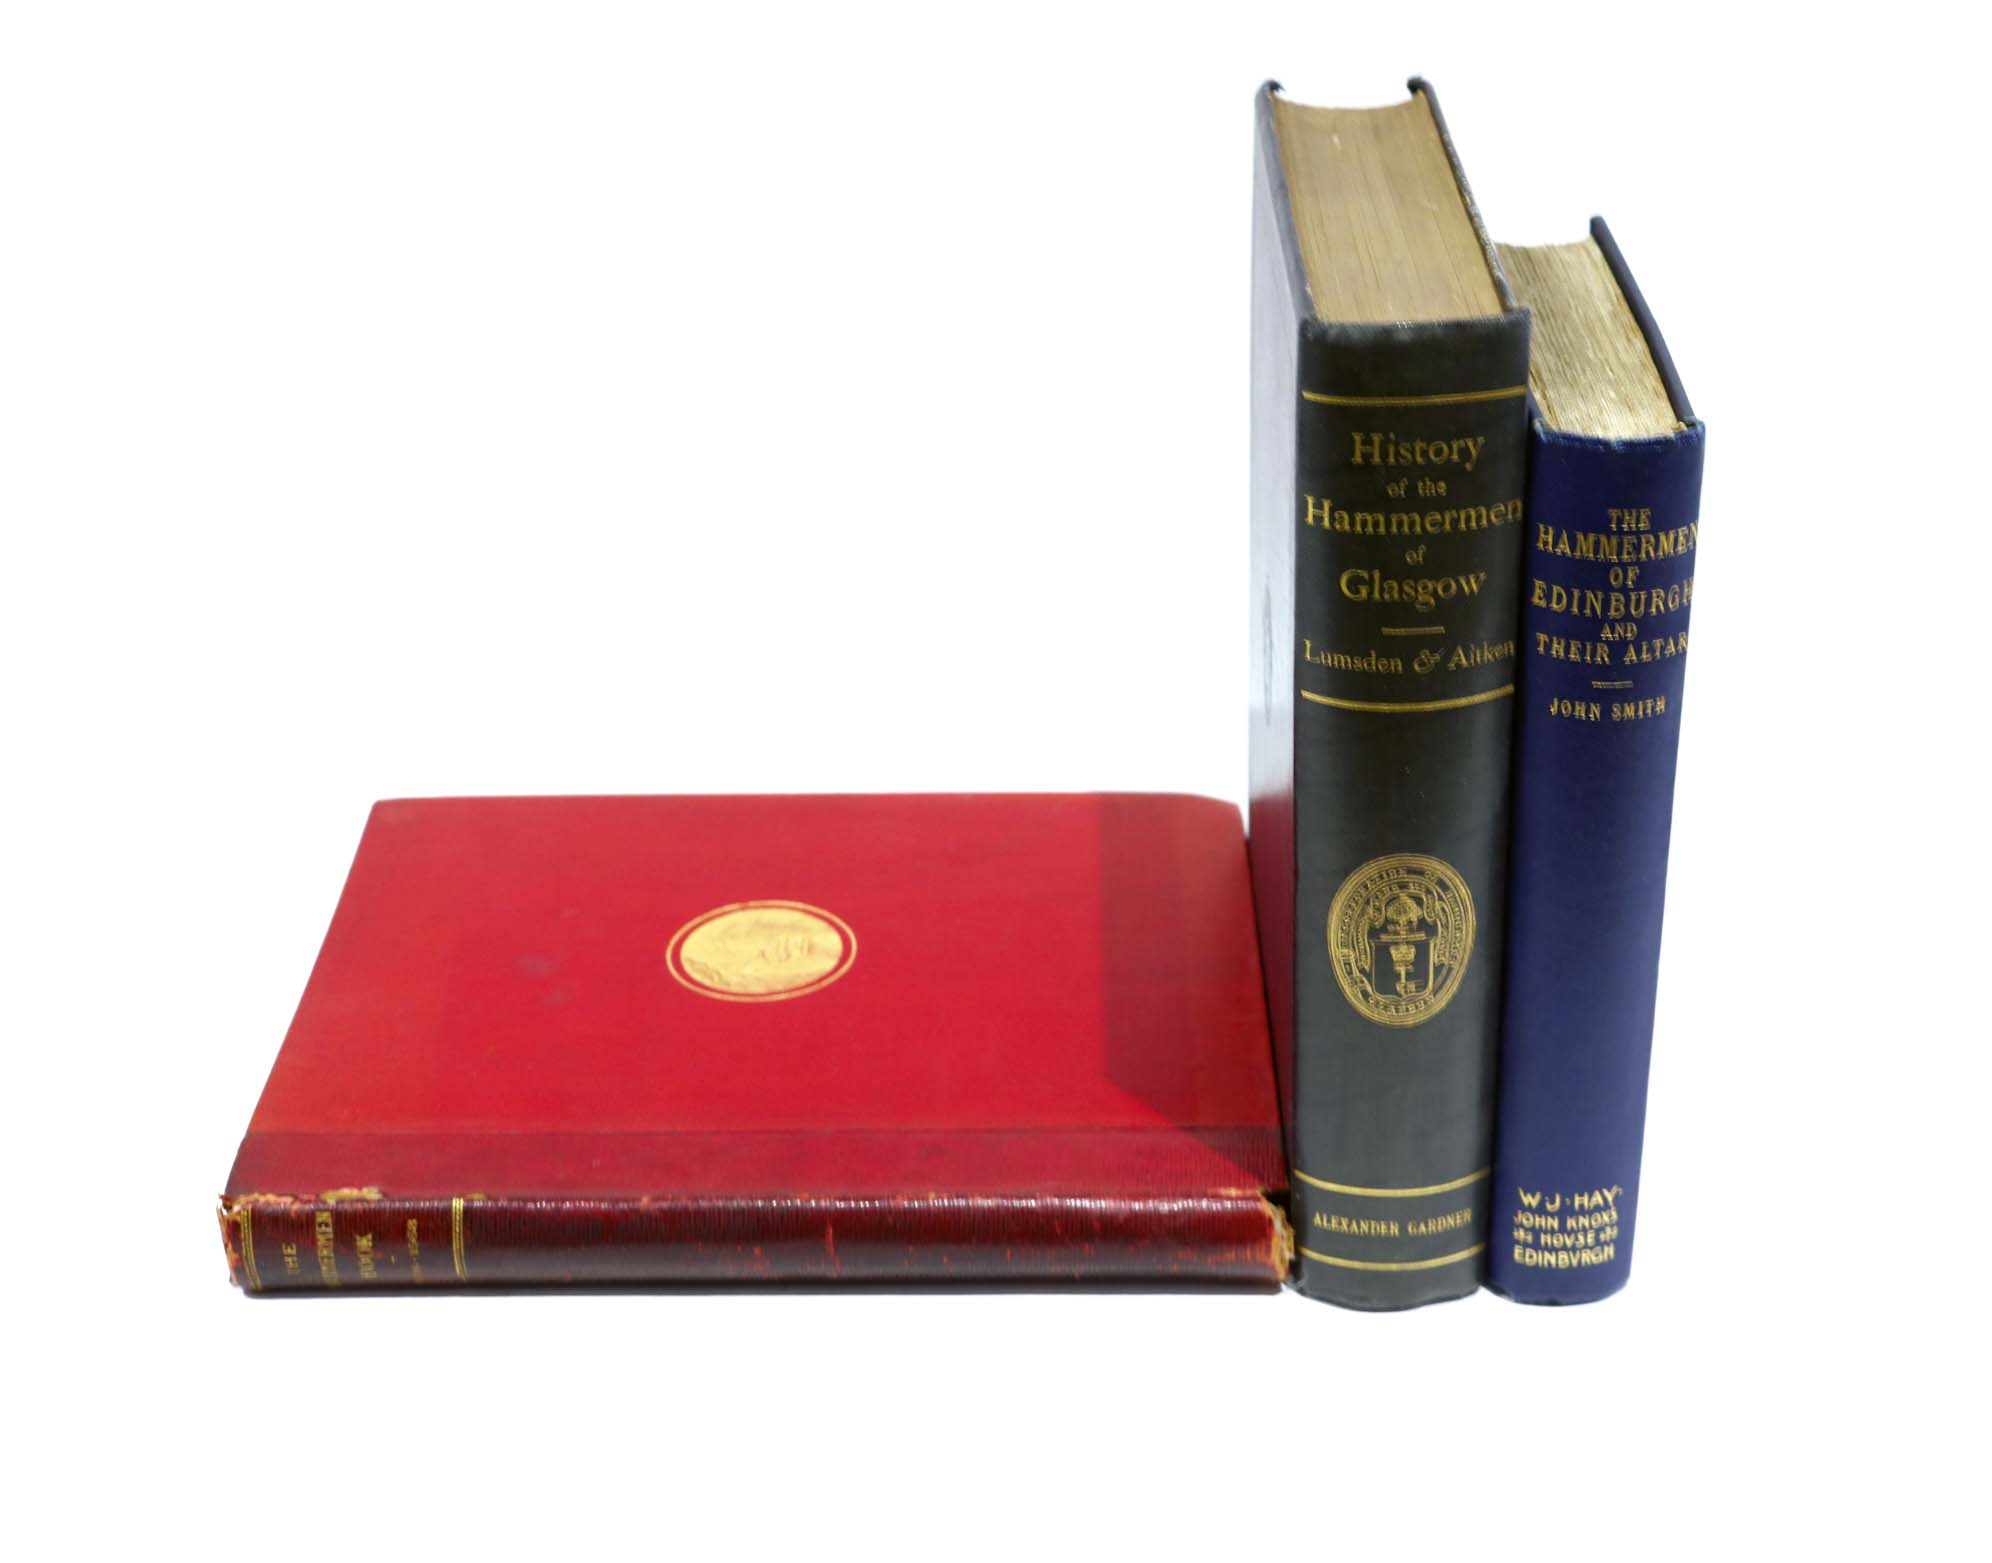 Lot 44 - Various:- Hunt, Colin A: The Perth Hammermen Book (1518-1568), printed Perth 1889, Lumsden & Aitken: